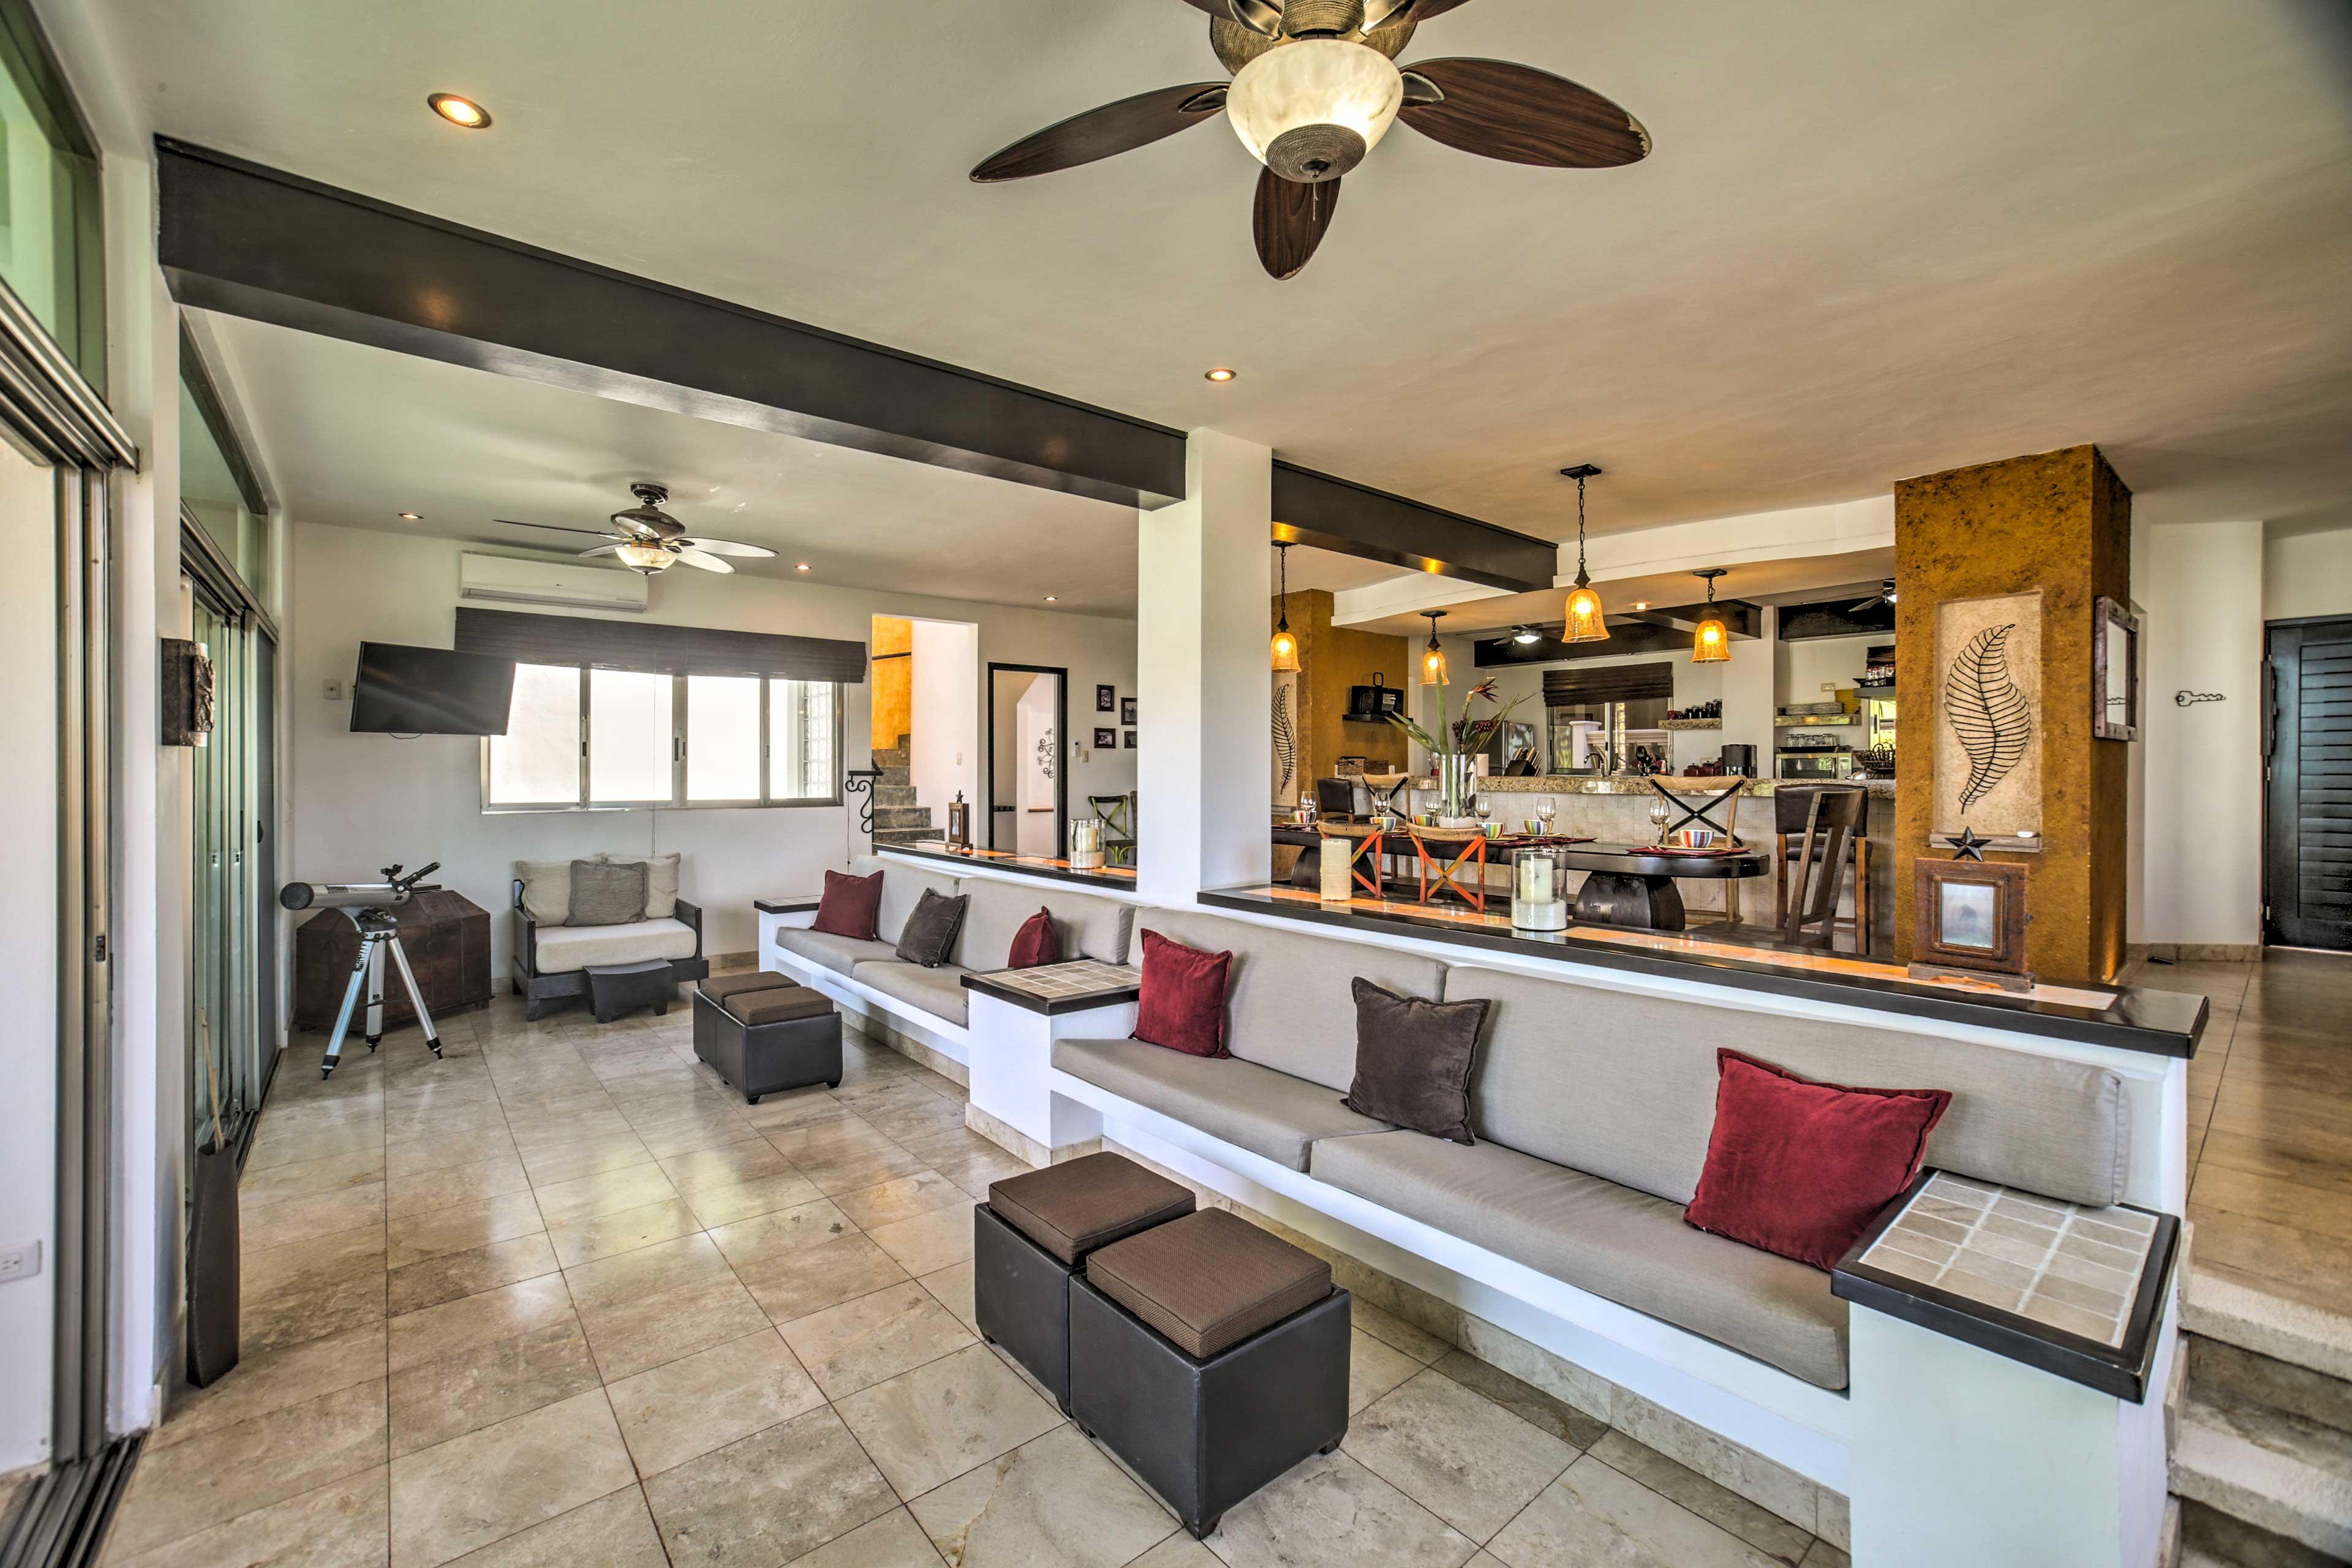 The estate consists of a main villa and 2 casitas.